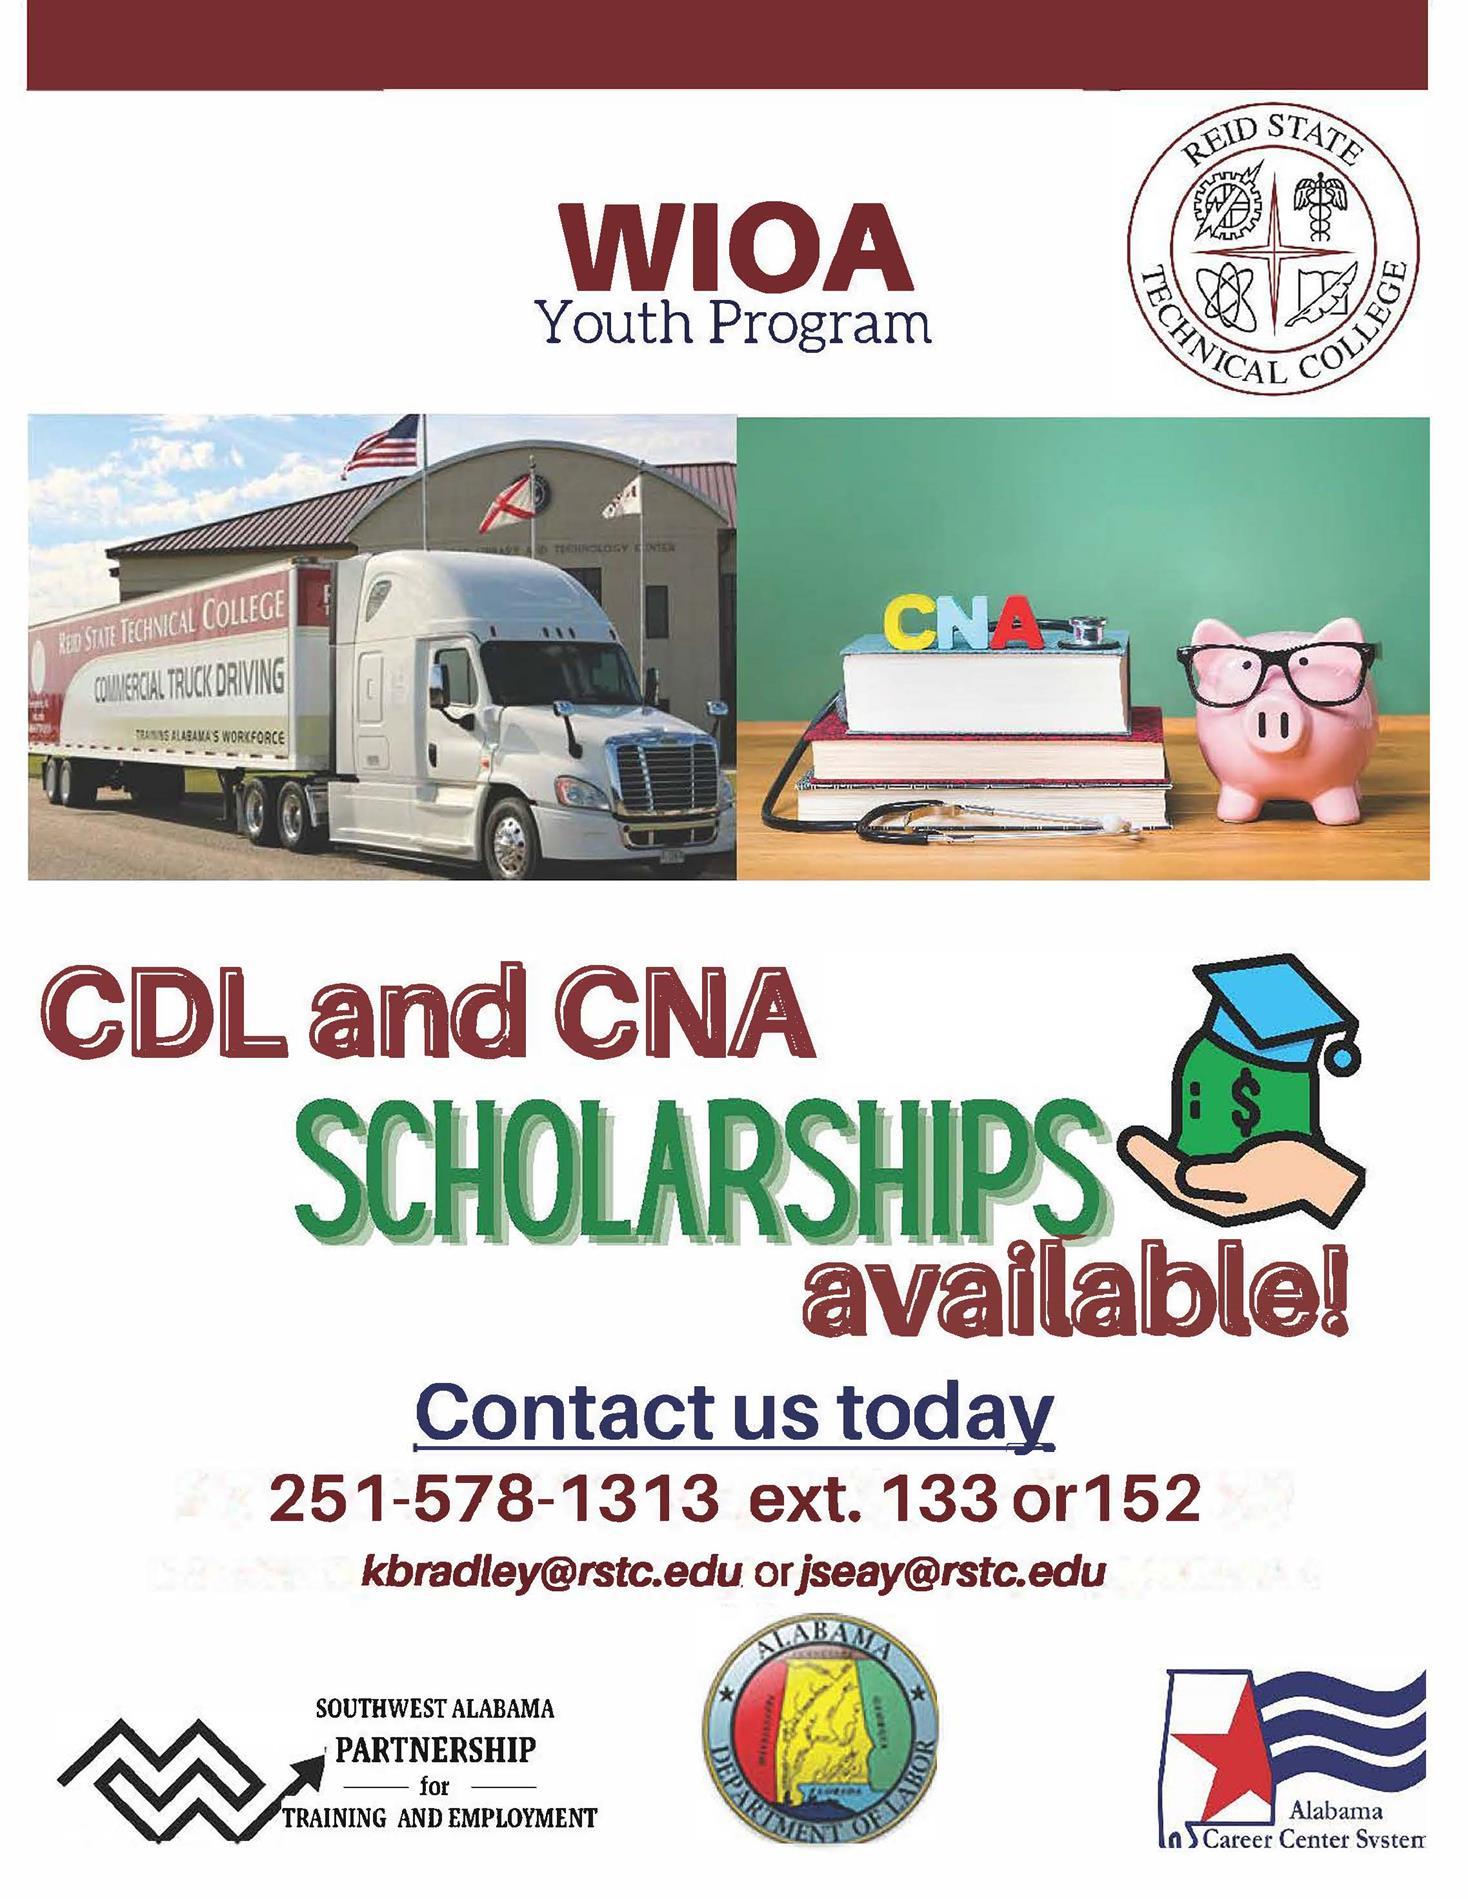 WIOA Scholarship